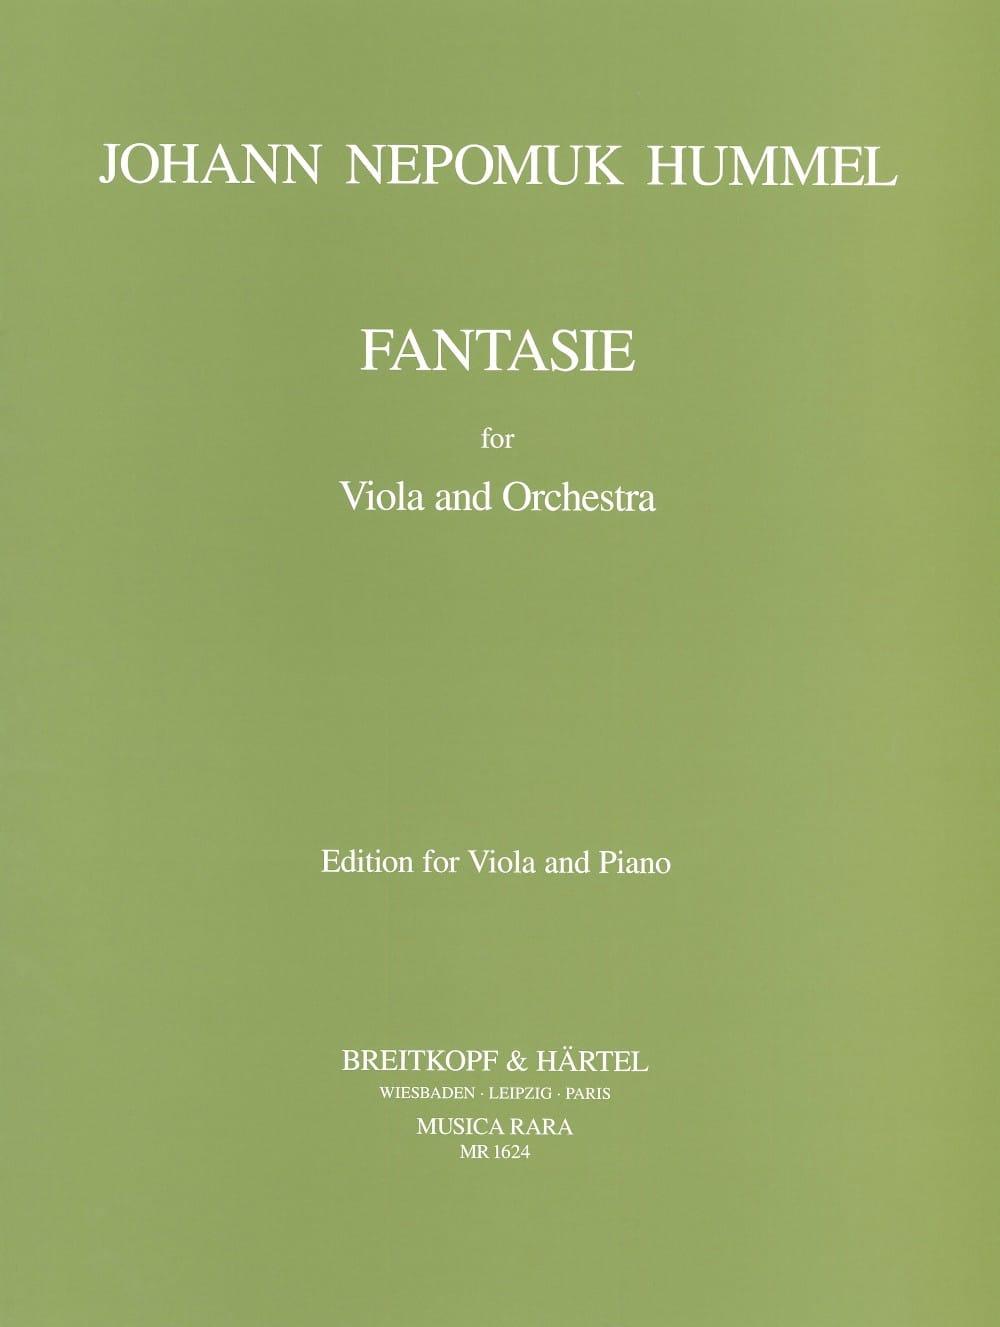 Fantasie - Viola - HUMMEL - Partition - Alto - laflutedepan.com